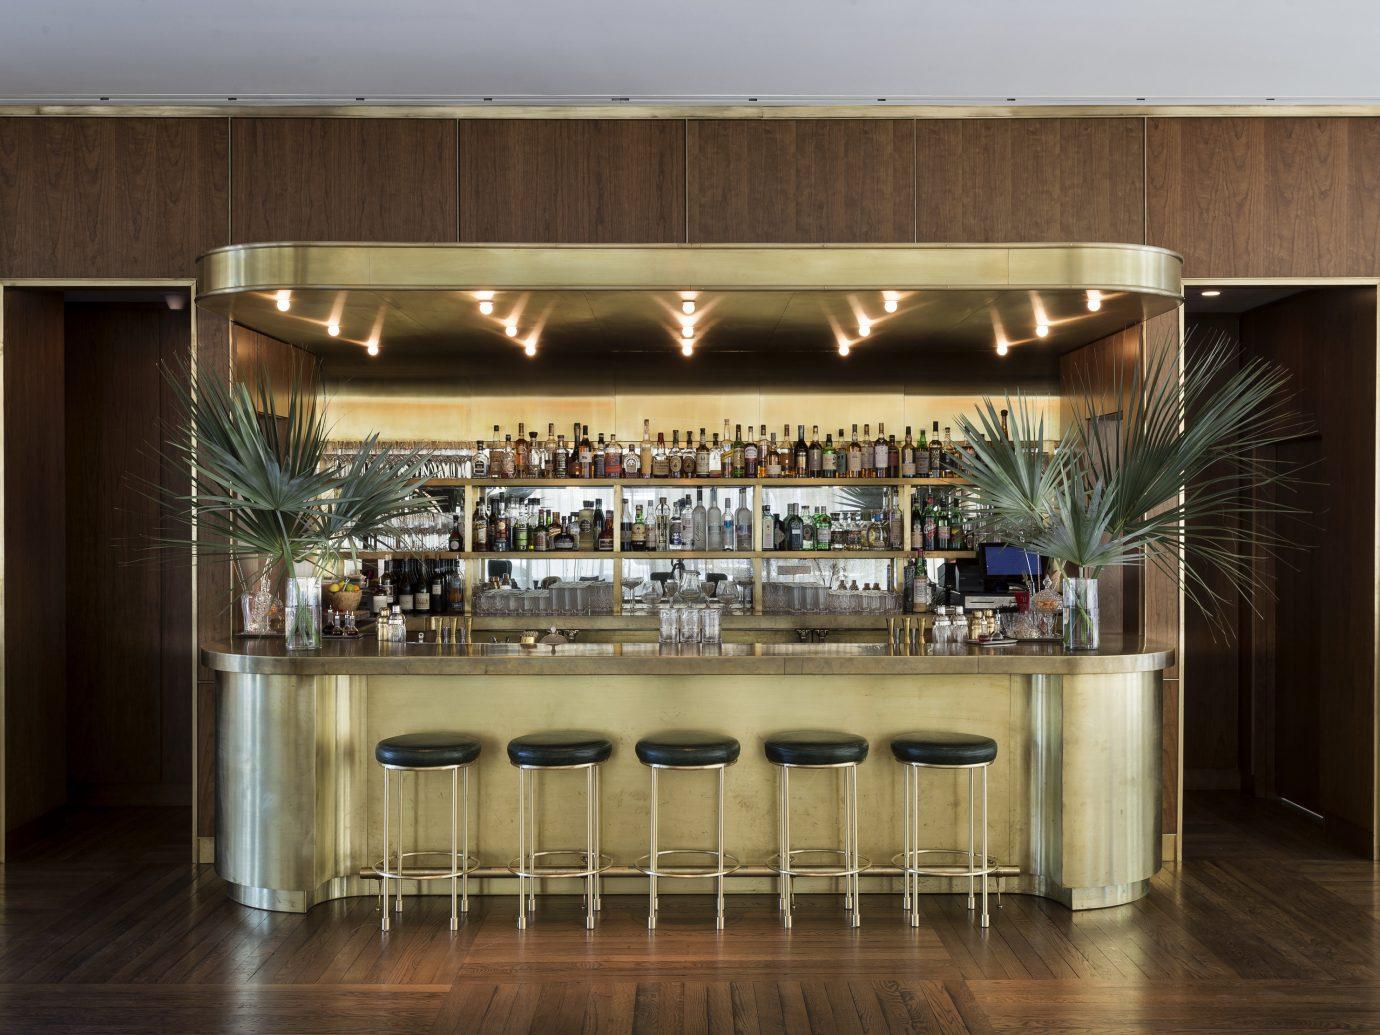 Hotels floor indoor Lobby interior design function hall Boutique Bar retail restaurant